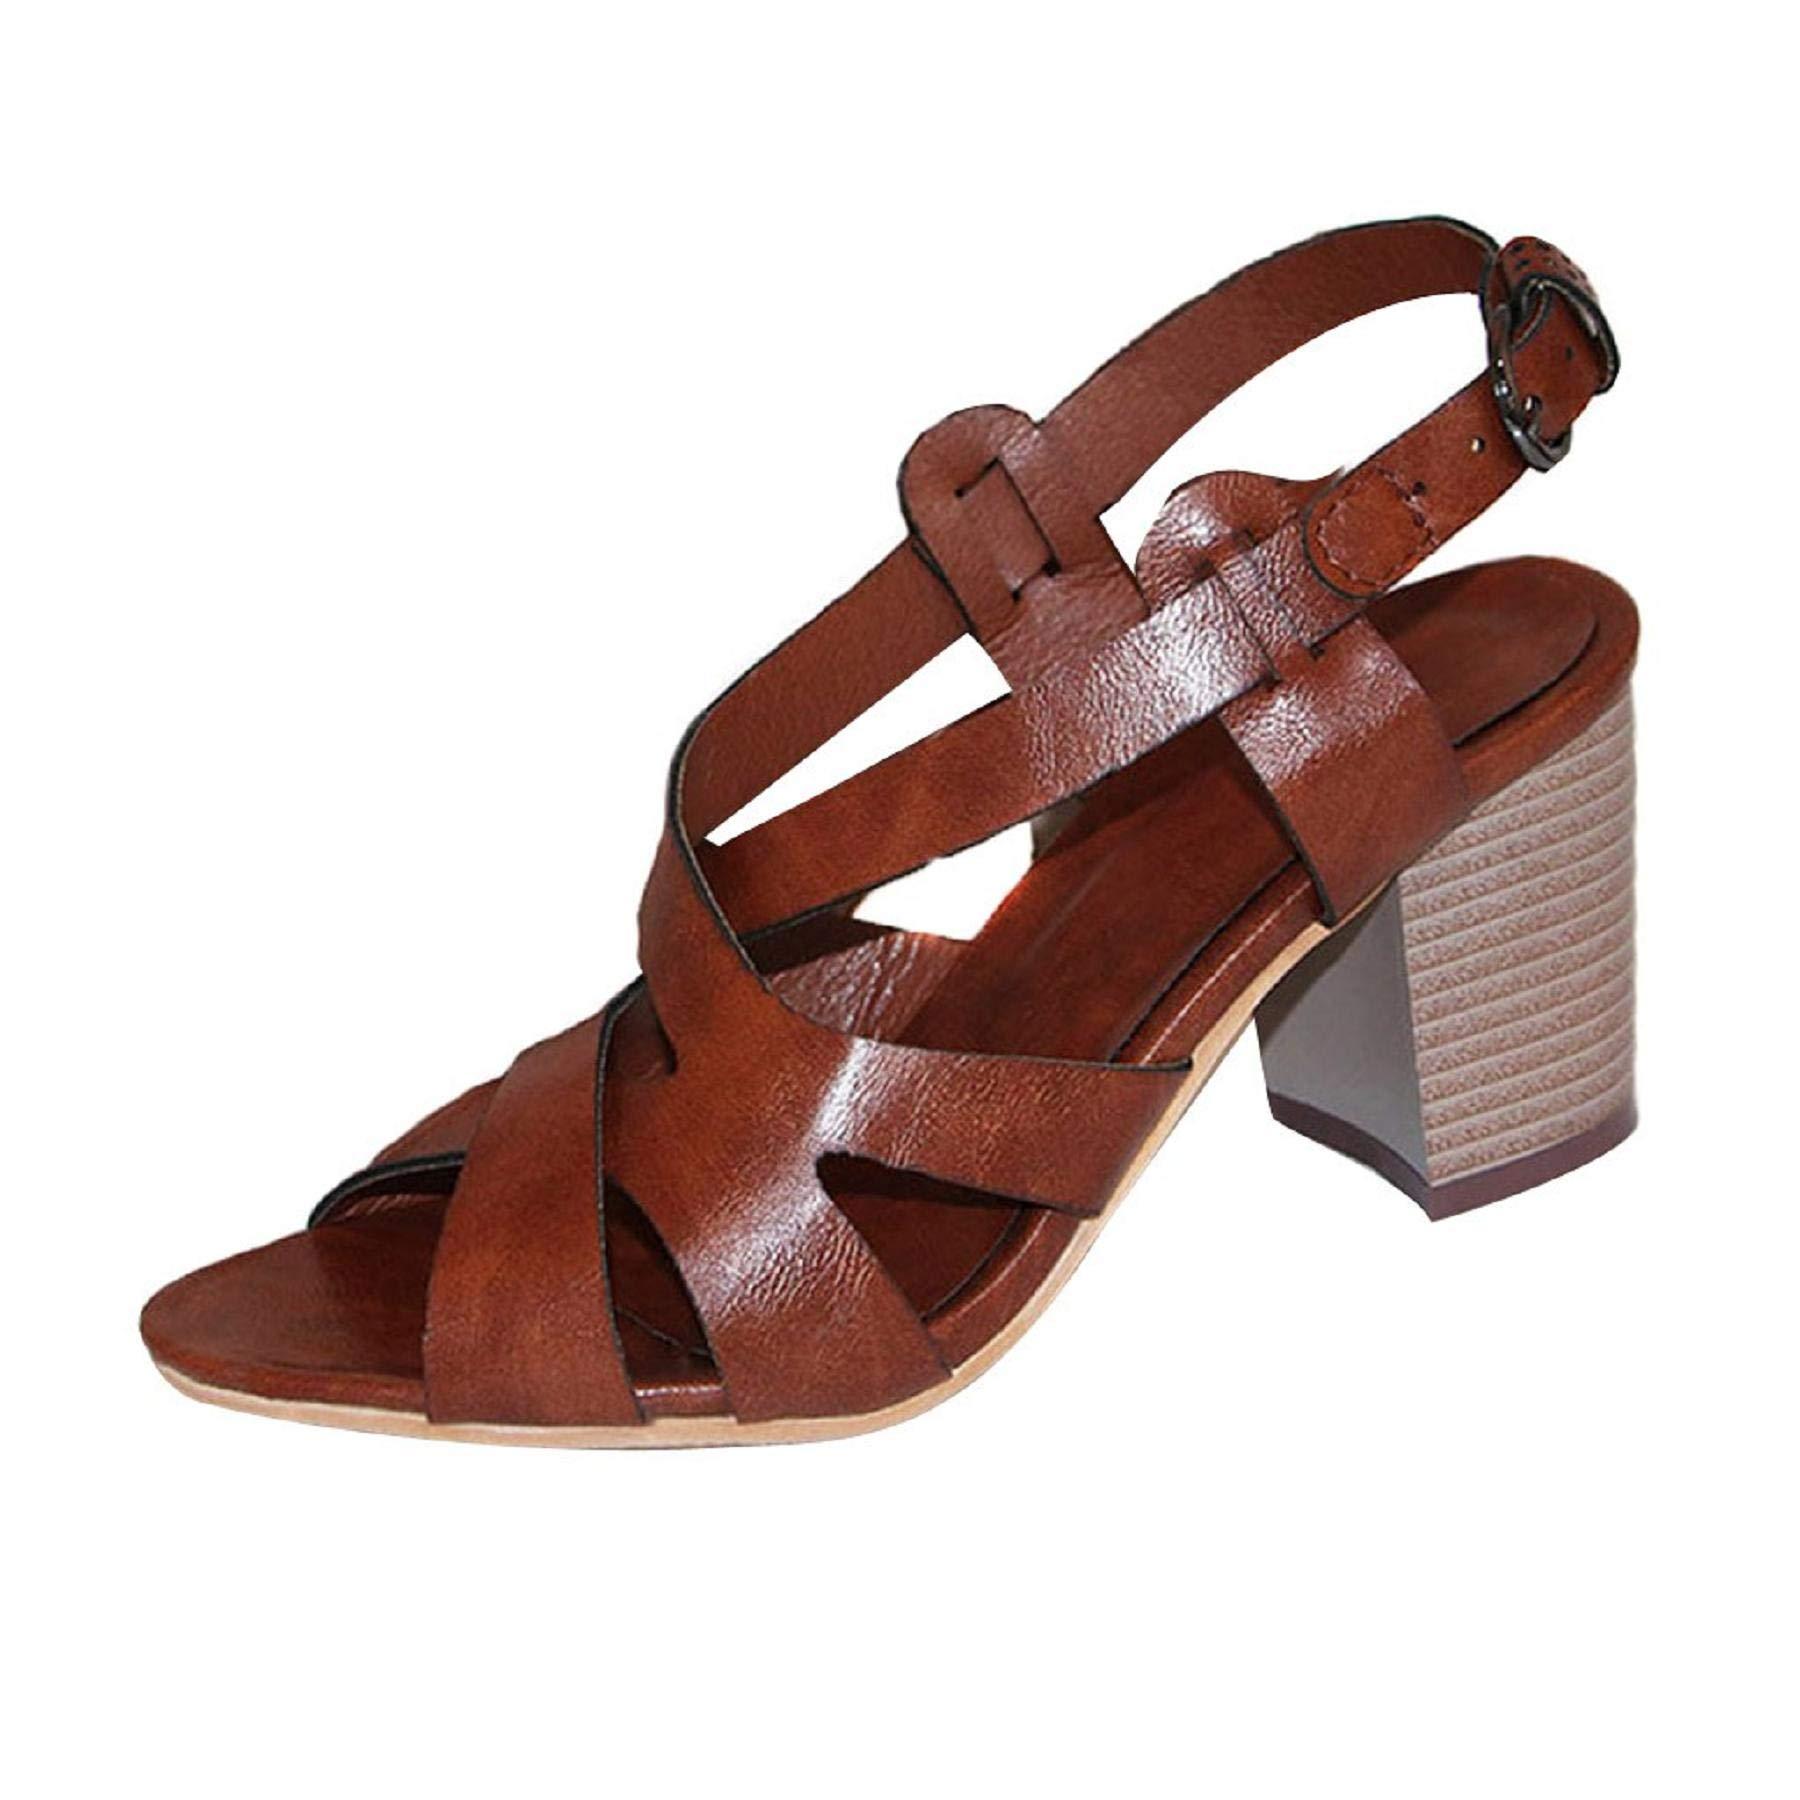 LEEDFORD Women's Open Toes Mid Chunky Heels Pumps Platform Crisscross Dress Sandals,Casual Summer Beach Gladiator Sandals Brown